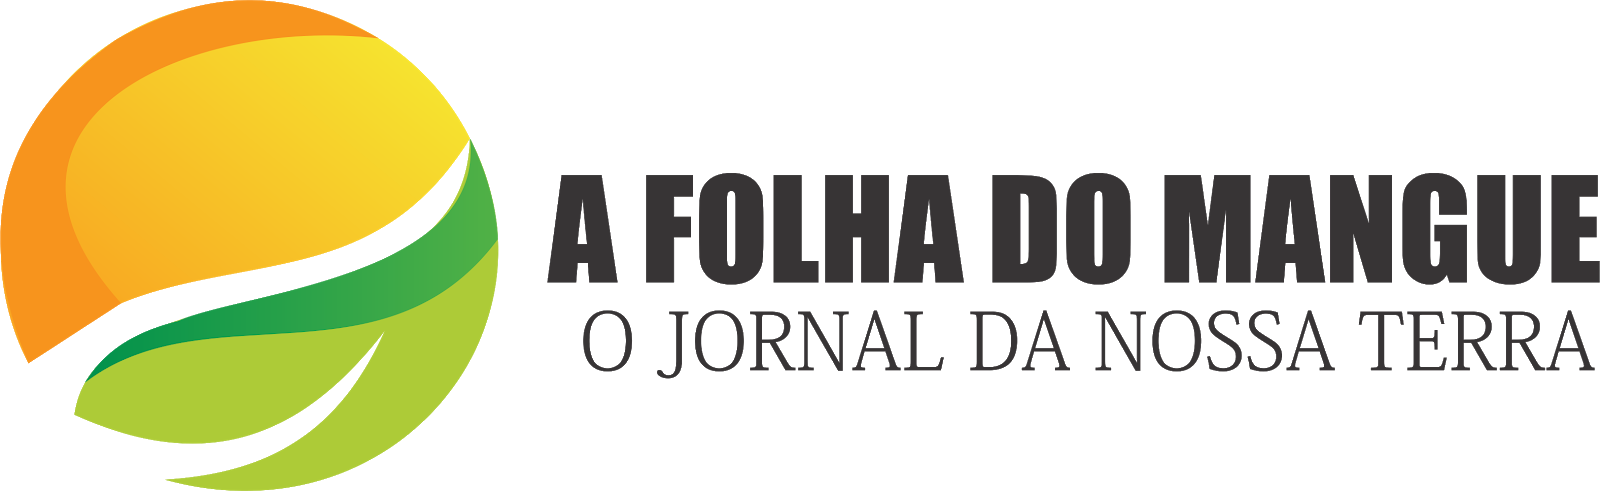 PORTAL A FOLHA DO MANGUE